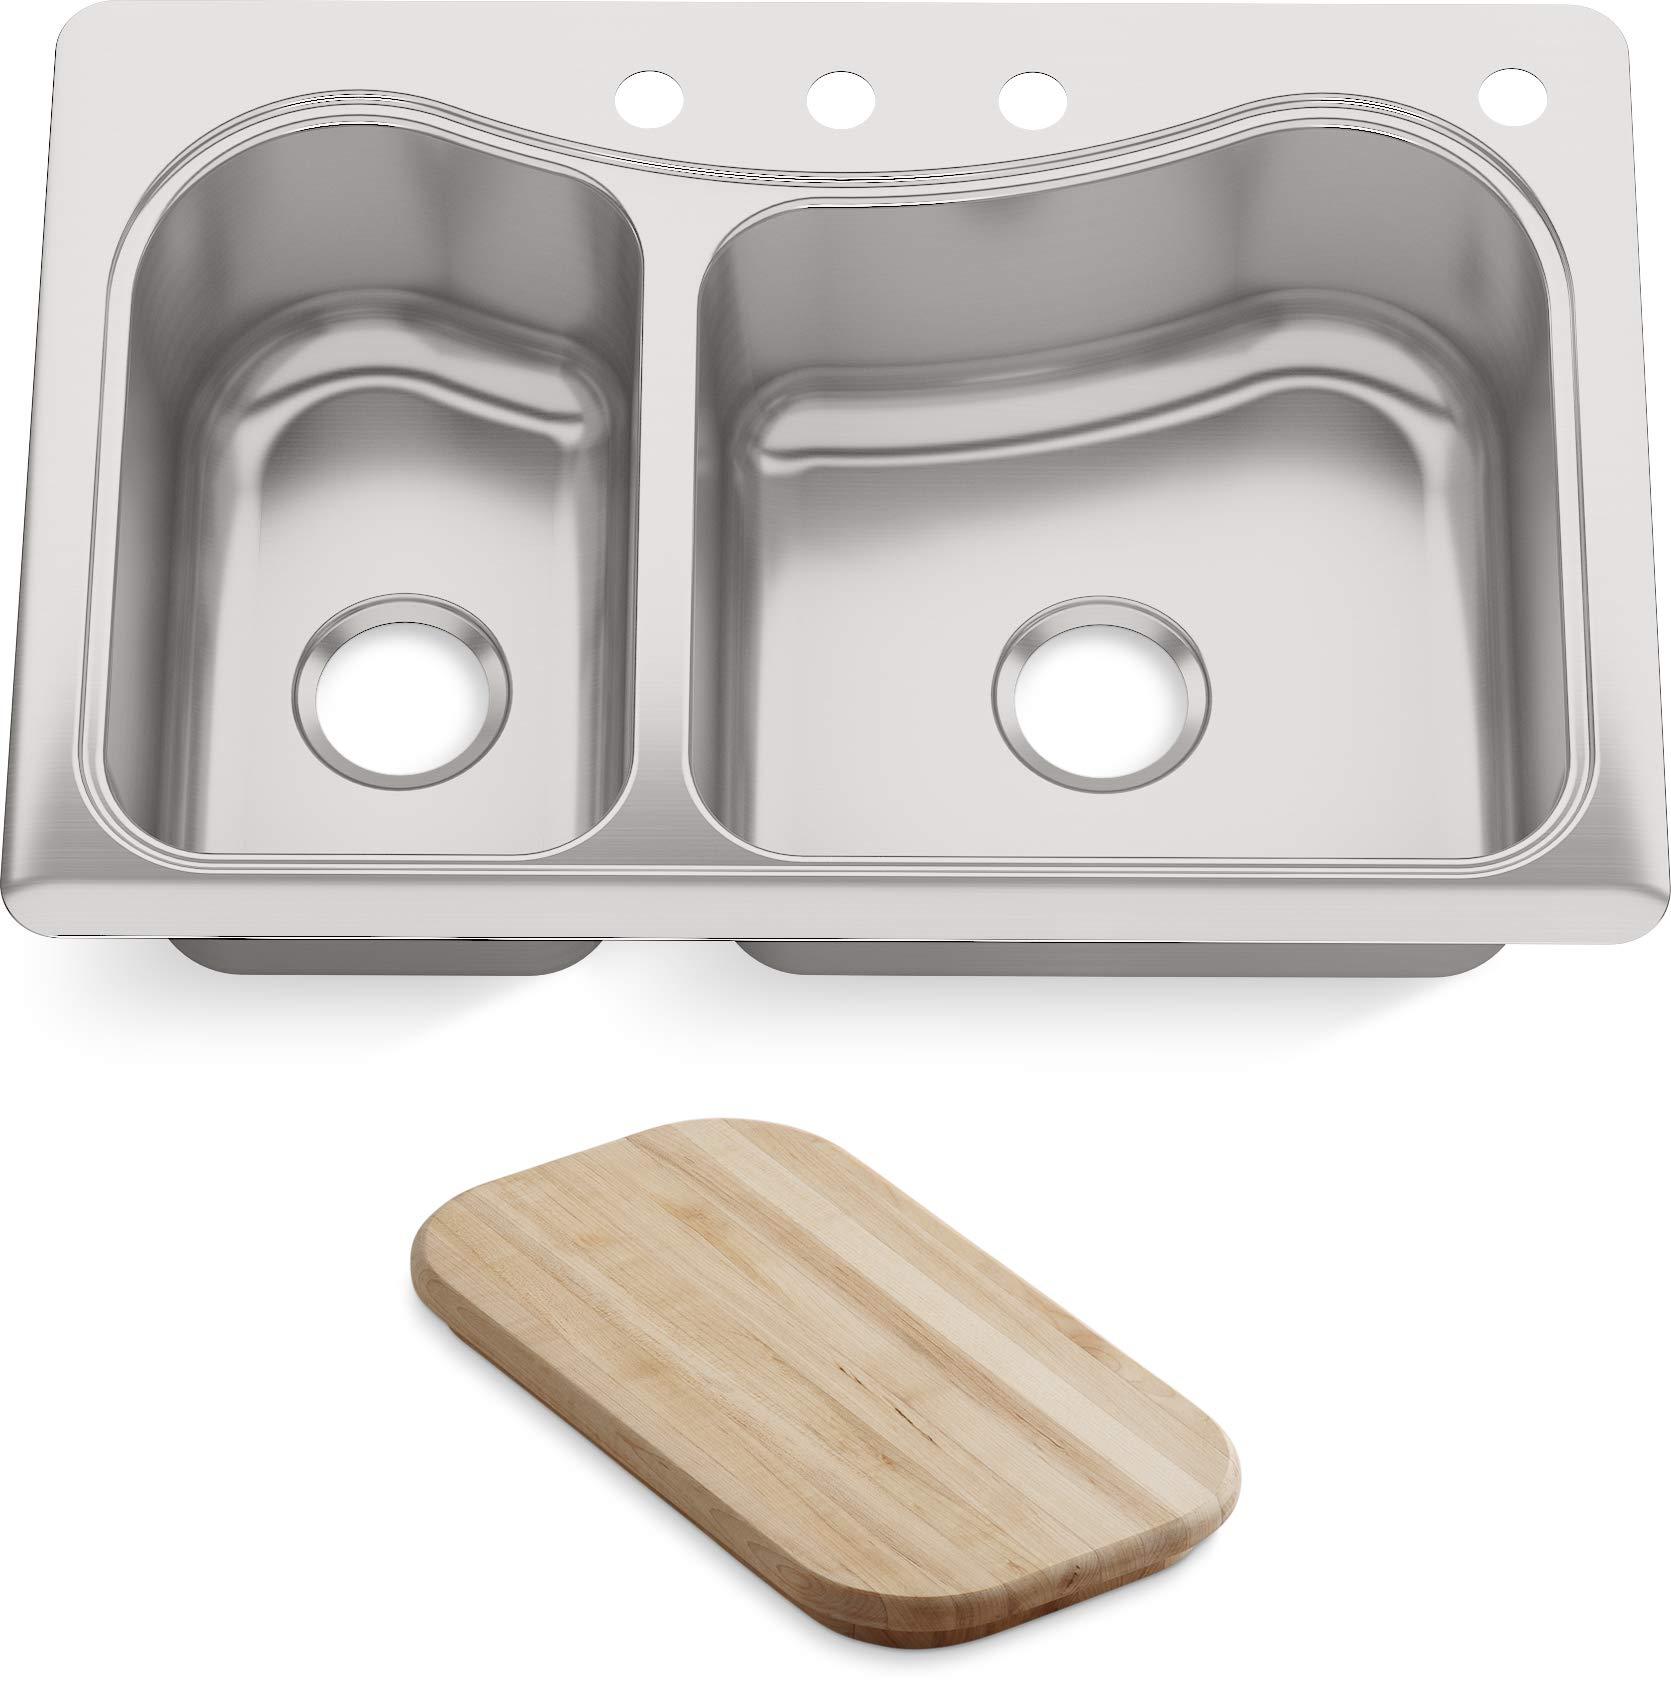 KOHLER K-3361-4-NA Staccato Dual Large/Medium Self-Rimming Kitchen Sink, Stainless Steel by Kohler